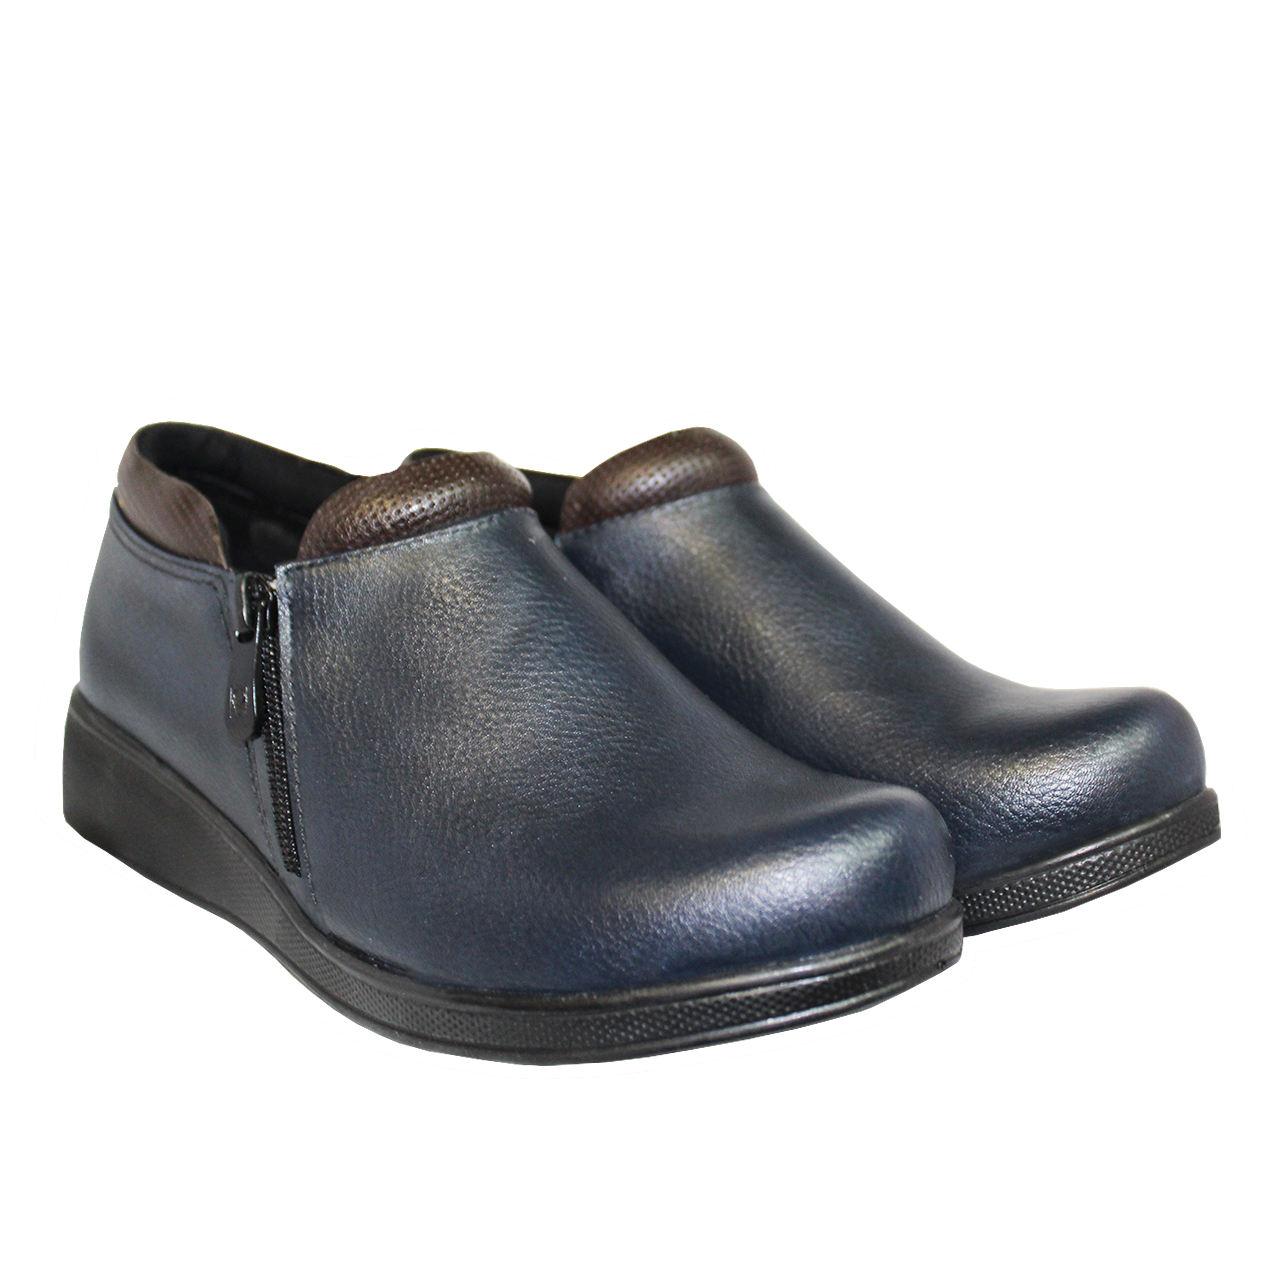 کفش روزمره زنانه لیانا کد 362-S -  - 2